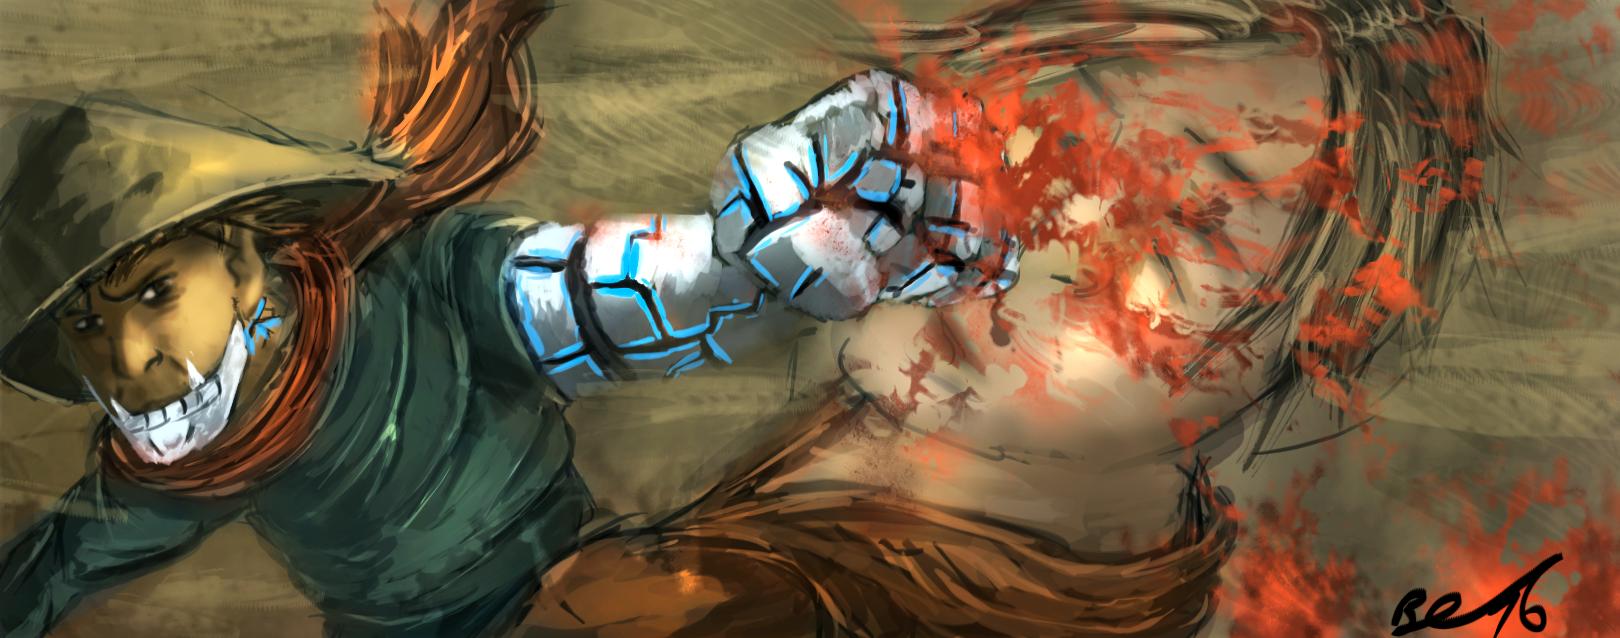 Shadowrun - The Rat's Nest   Adventure Log   Obsidian Portal